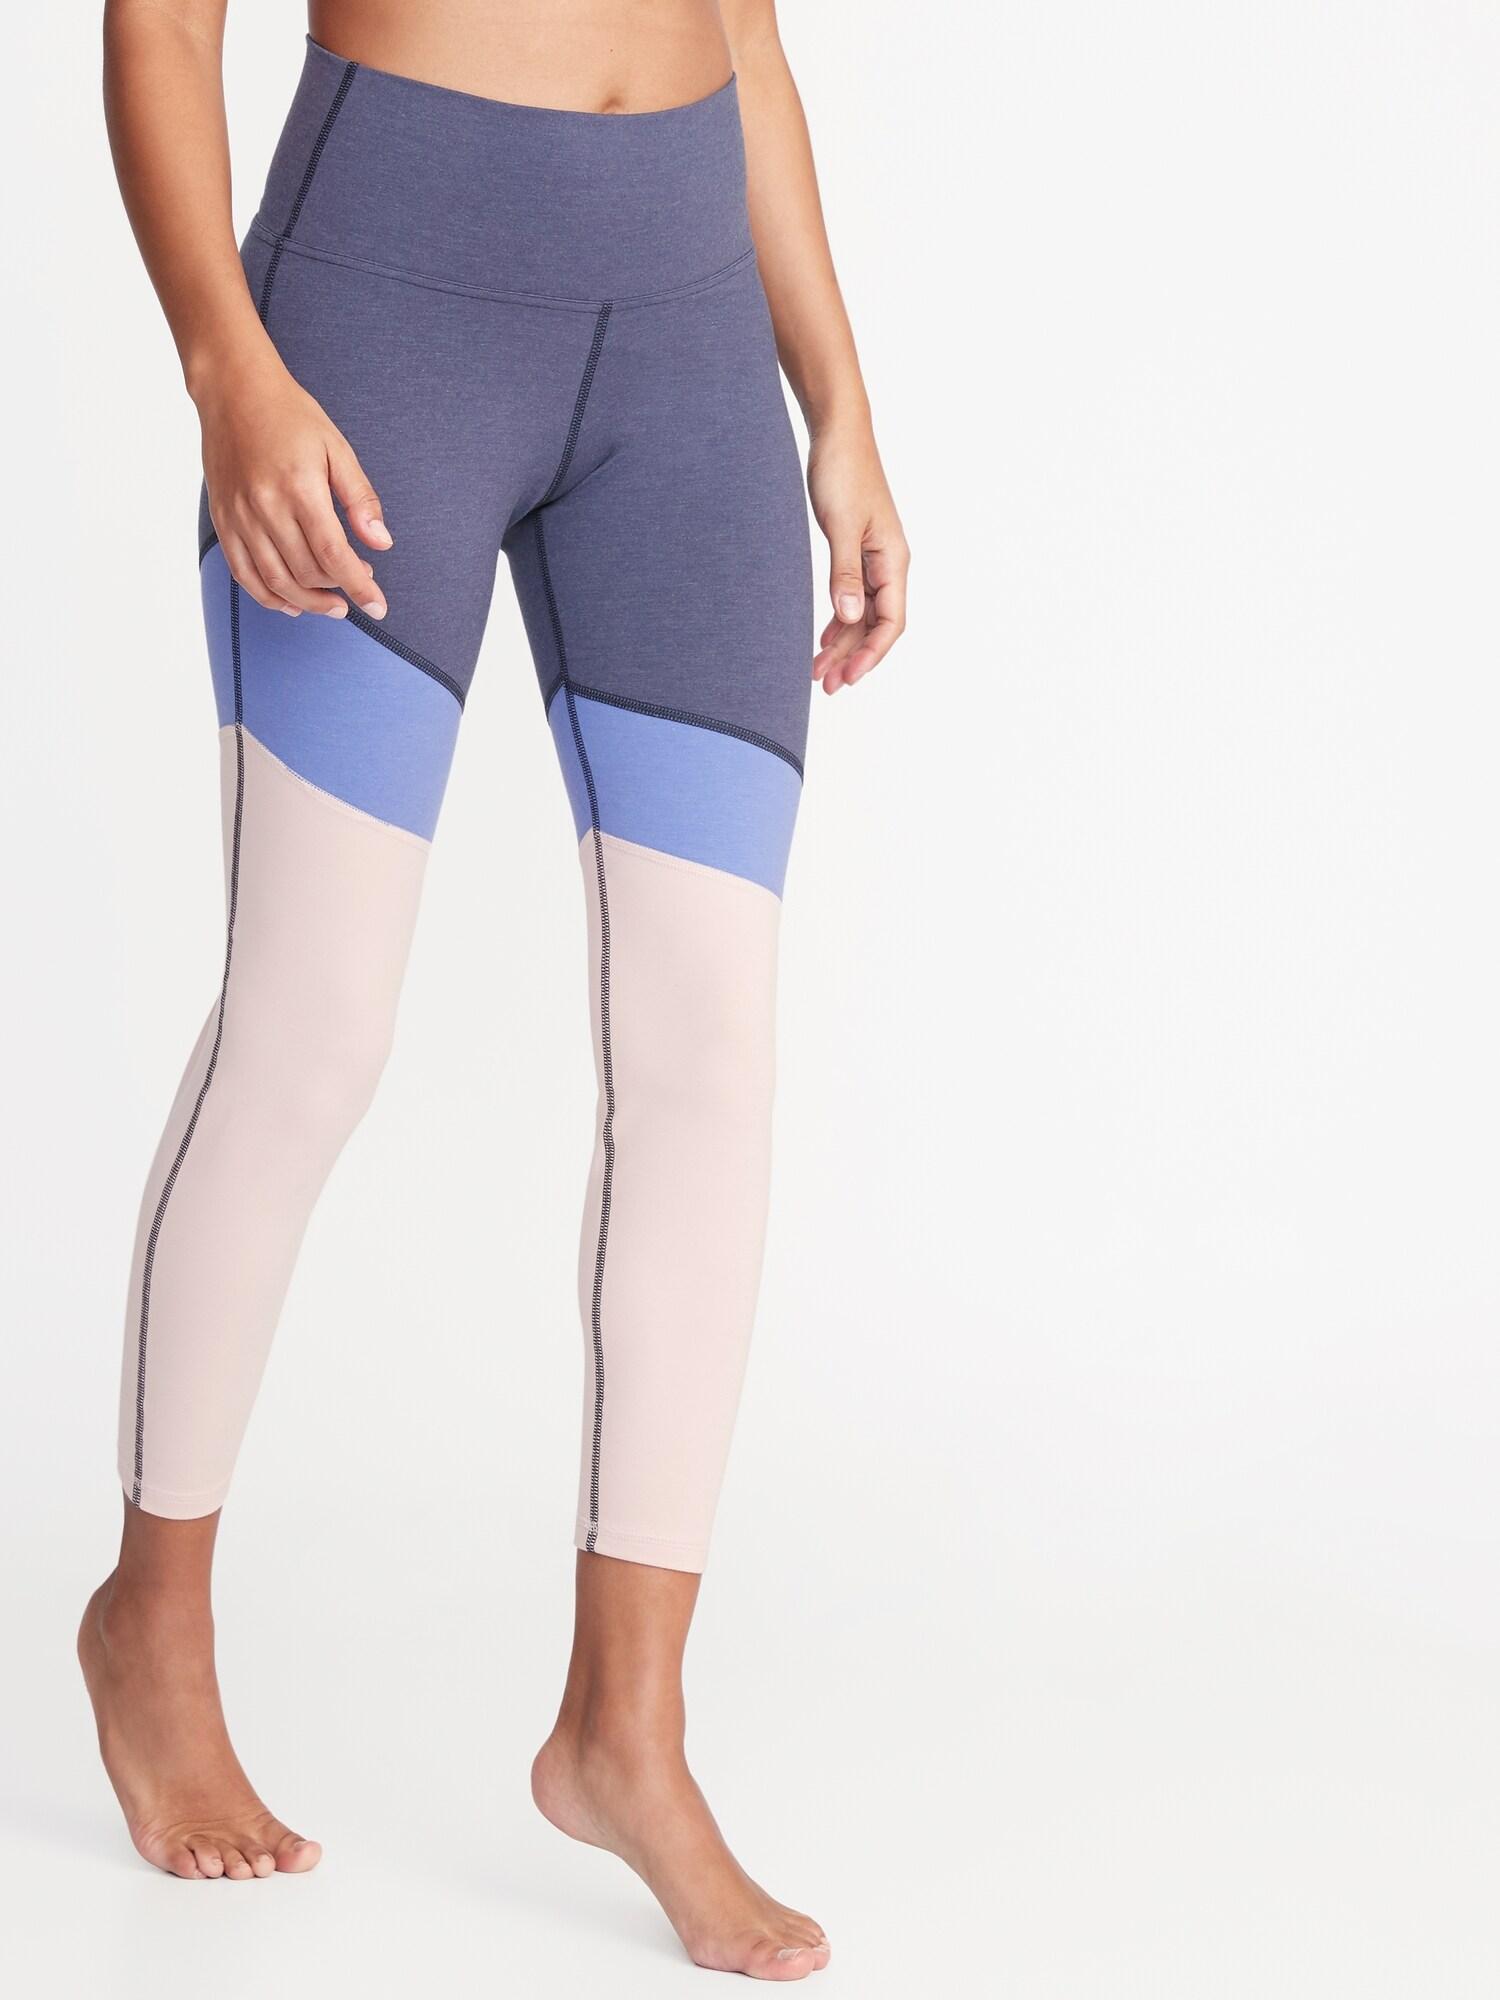 2af488e6ed6f1 High-Rise Color-Blocked 7/8-Length Yoga Leggings for Women | Old Navy